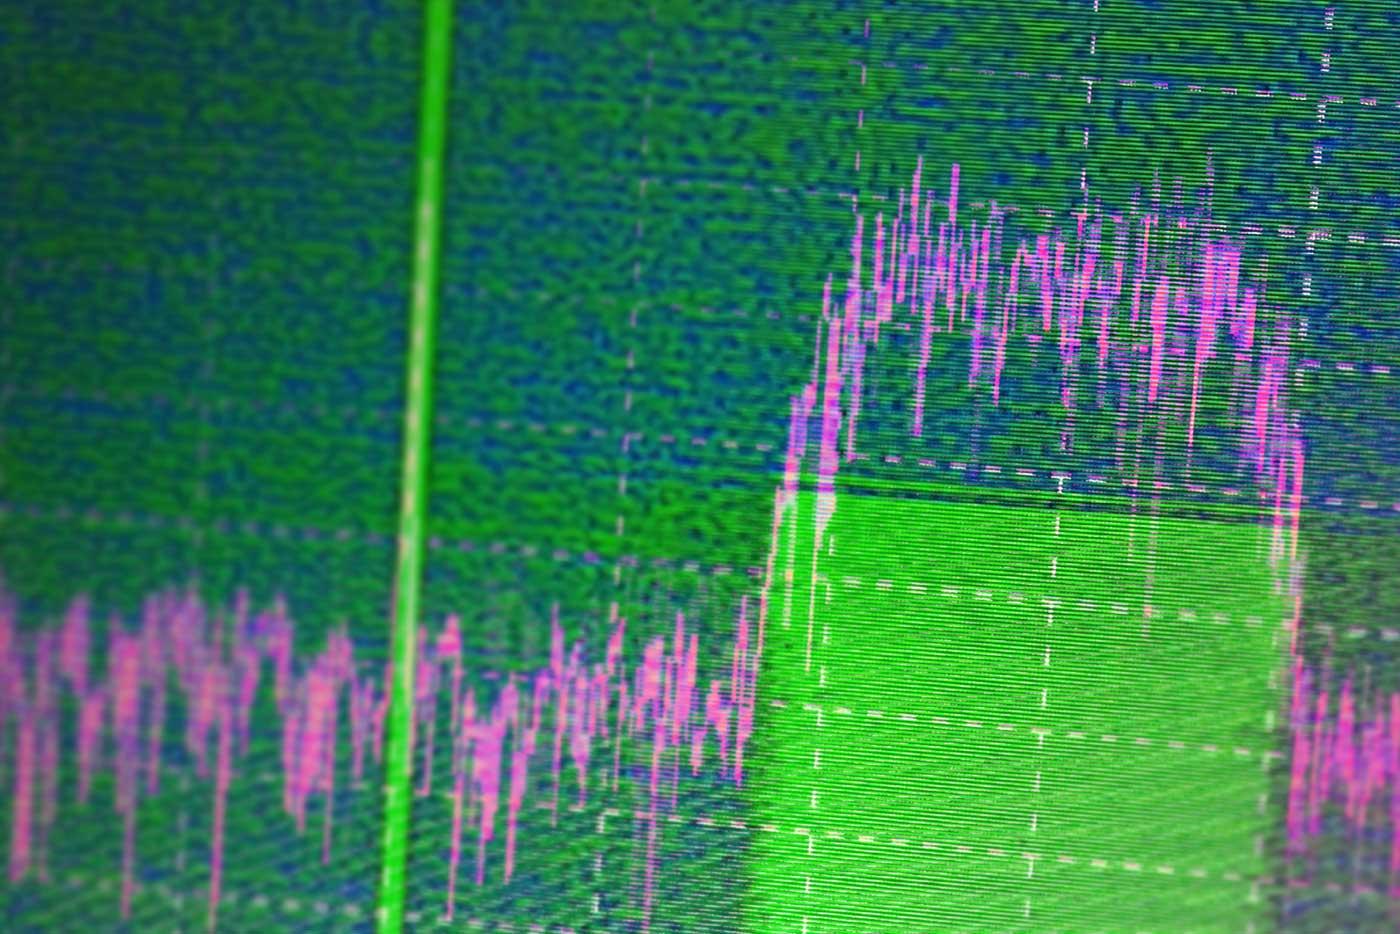 Radio sensor reading